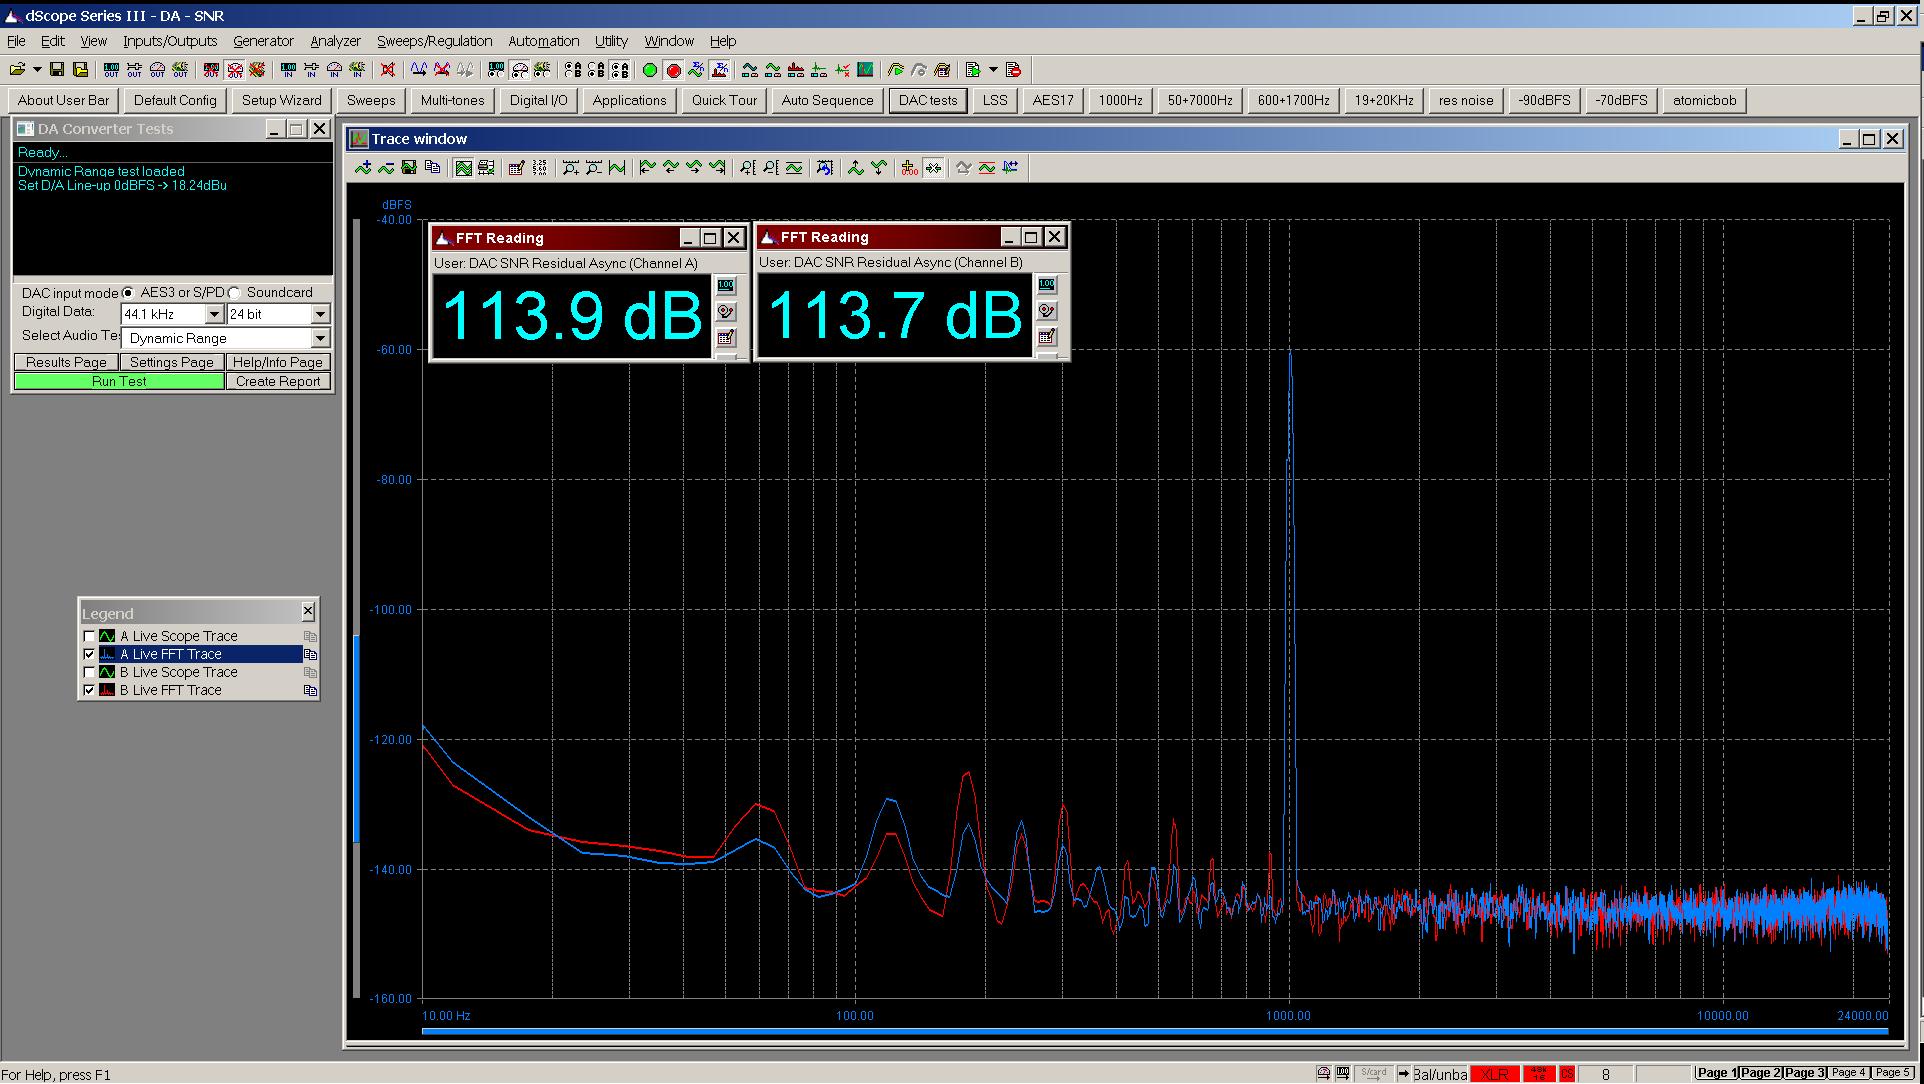 20190323-14 solaris Bal dynamic range - AES.PNG